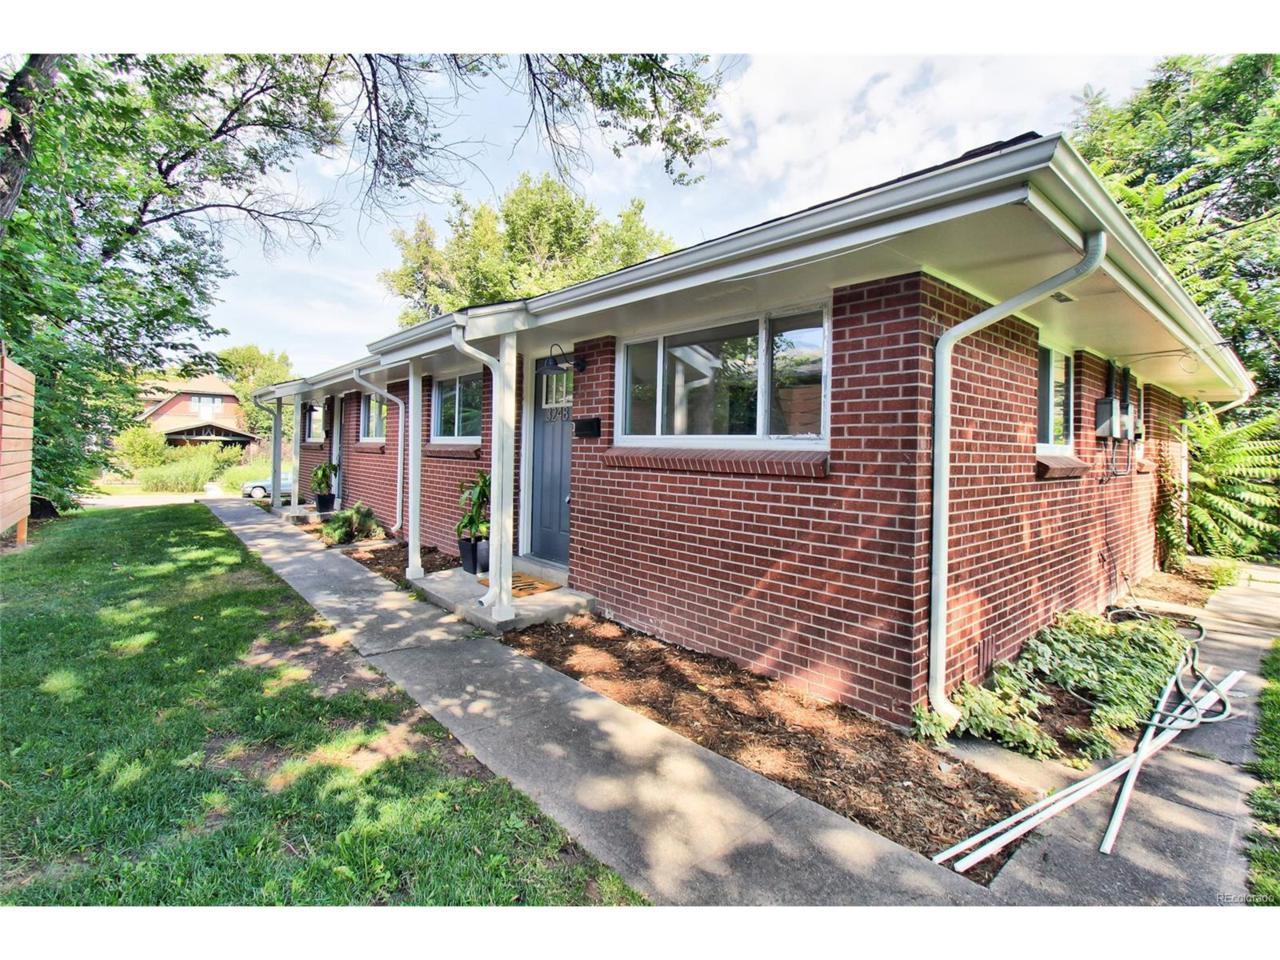 3248 N Columbine Street, Denver, CO 80205 (MLS #7814011) :: 8z Real Estate